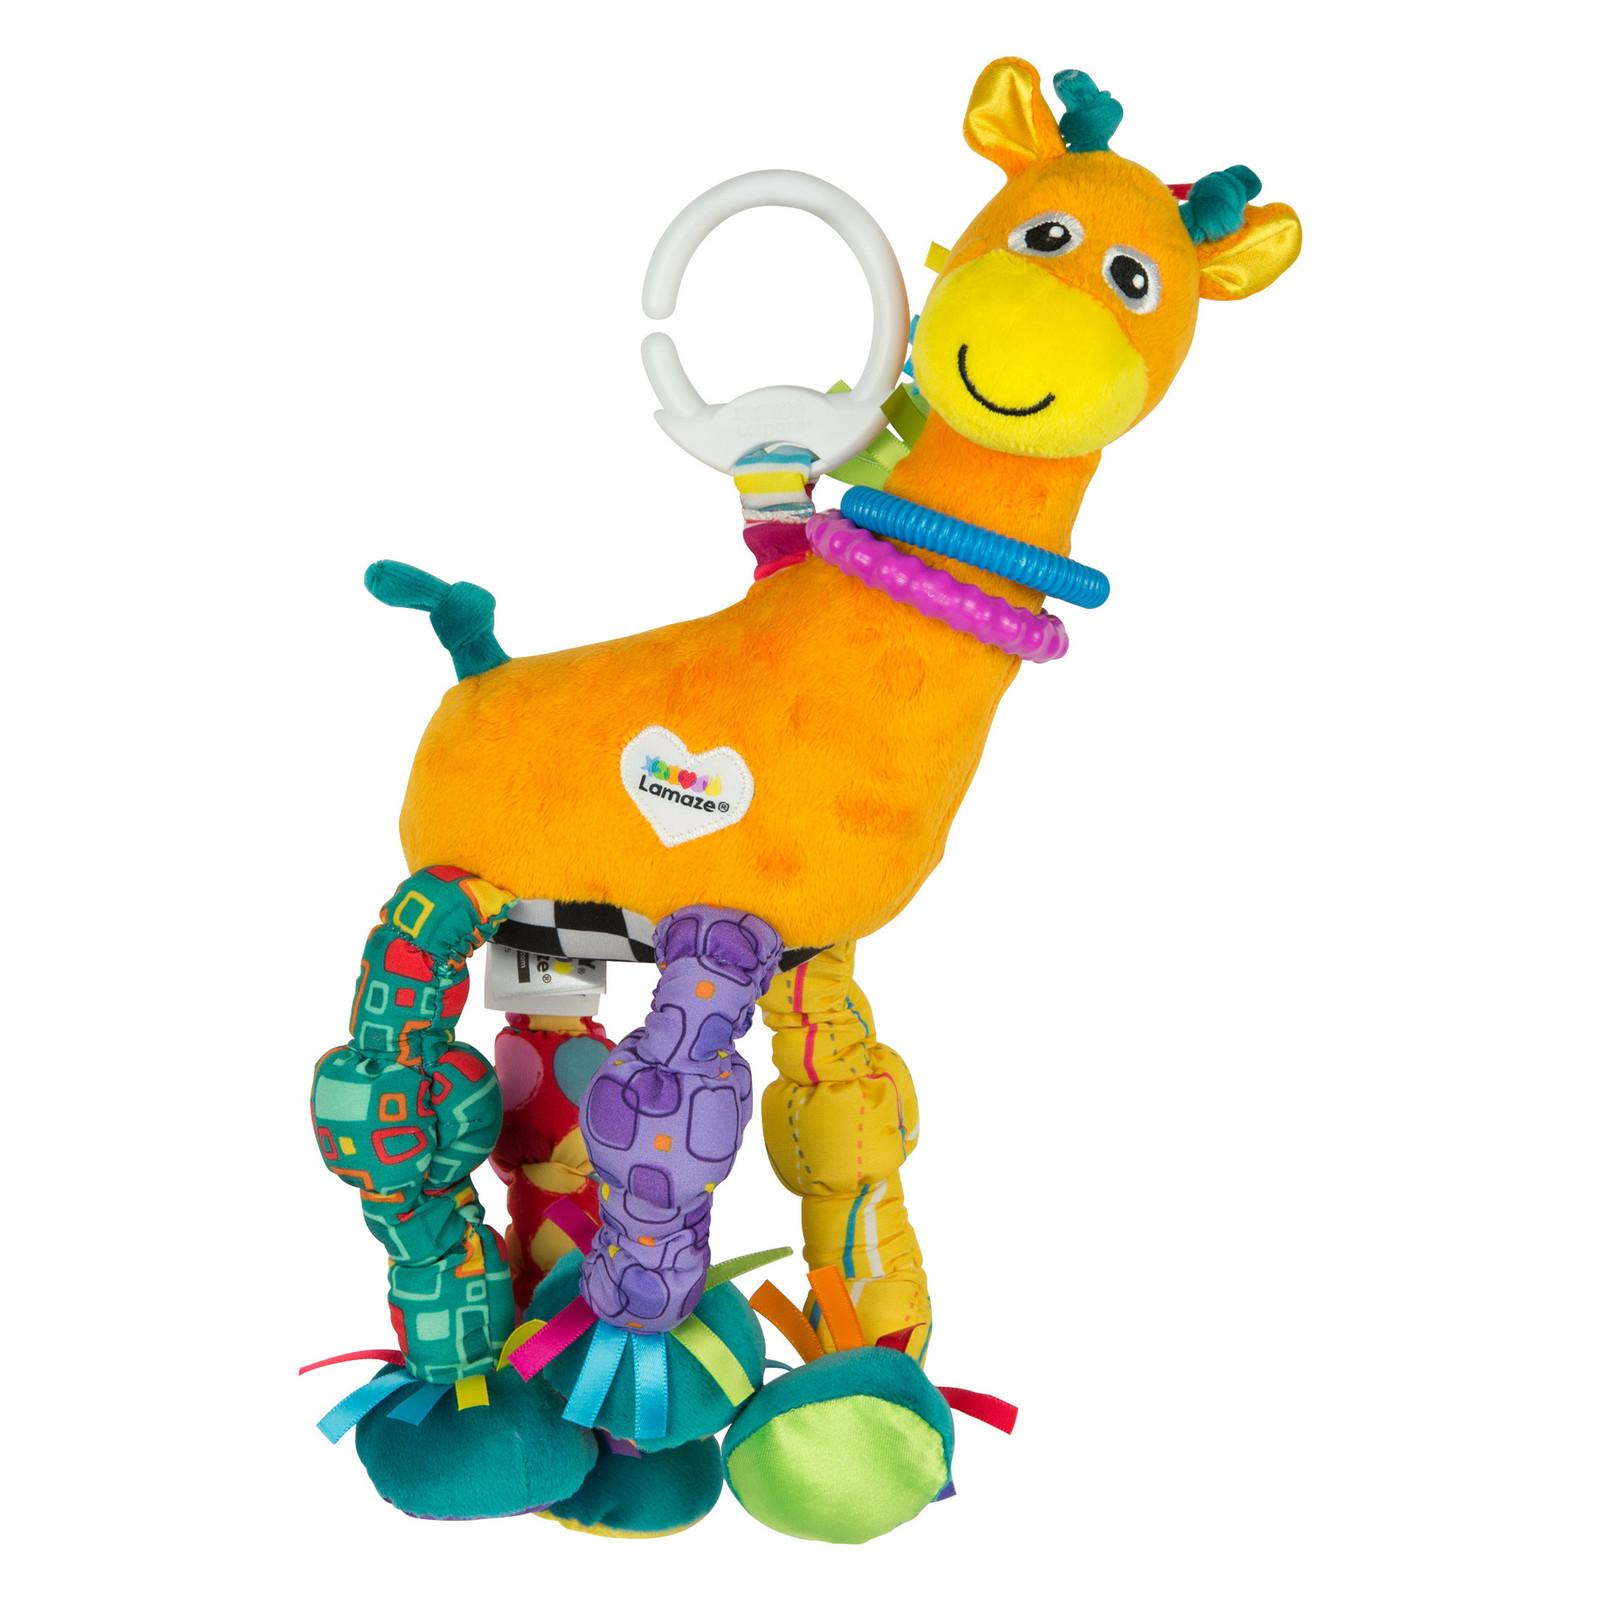 Lamaze: Stretch the Giraffe image